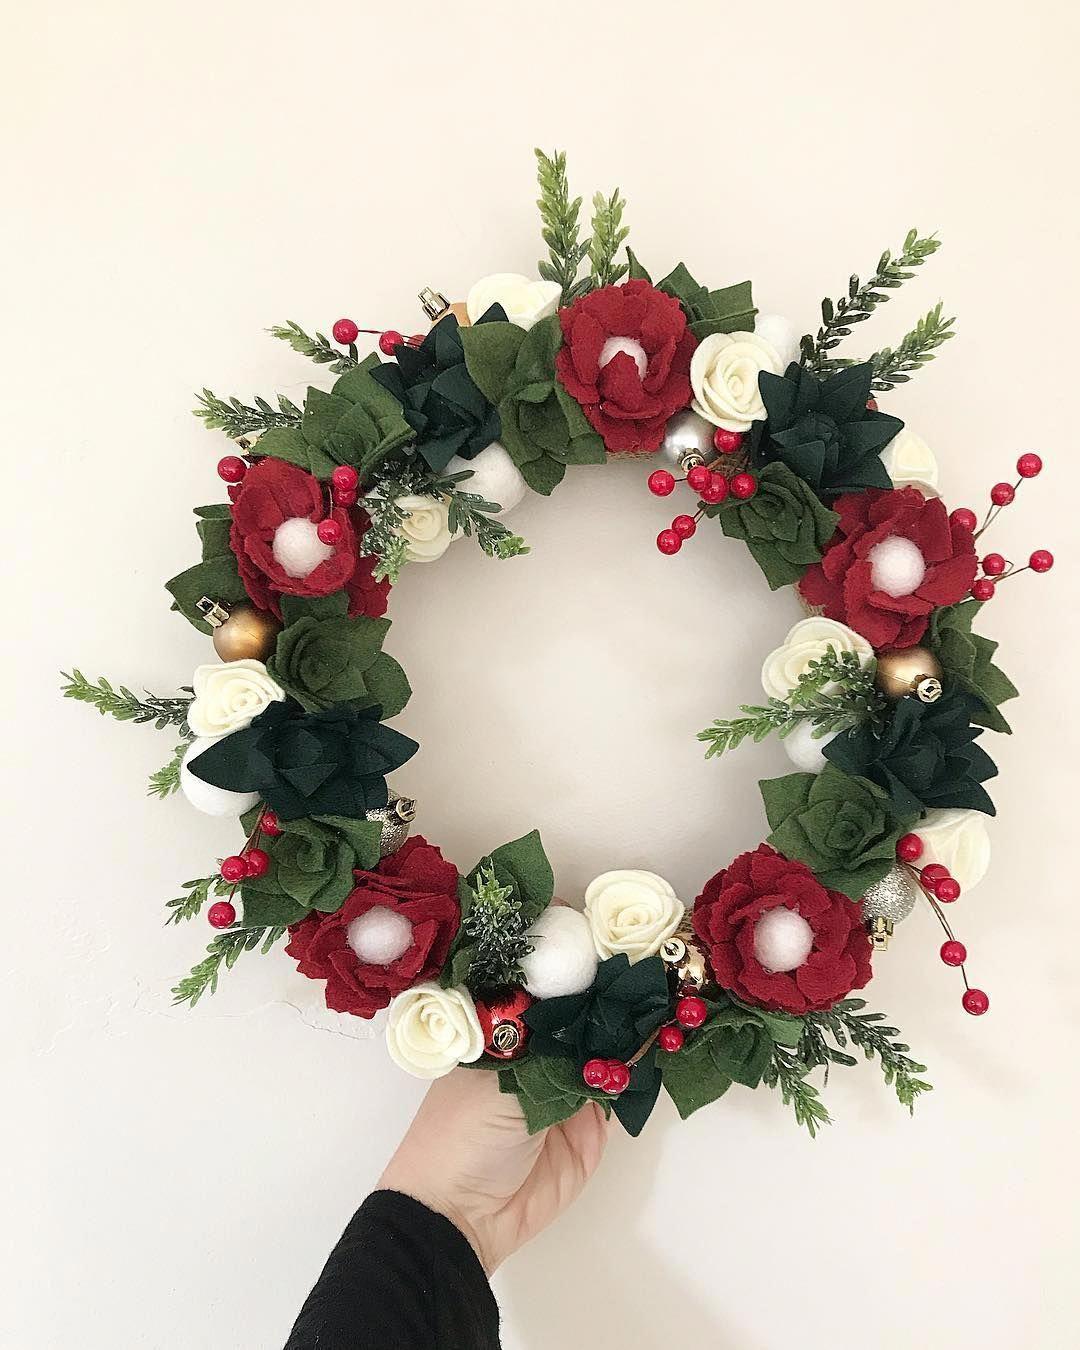 Christmas Wreaths With Lights And Timer Christmas Music Events Near Me Felt Flower Wreaths Christmas Craft Kit Christmas Crafts Diy